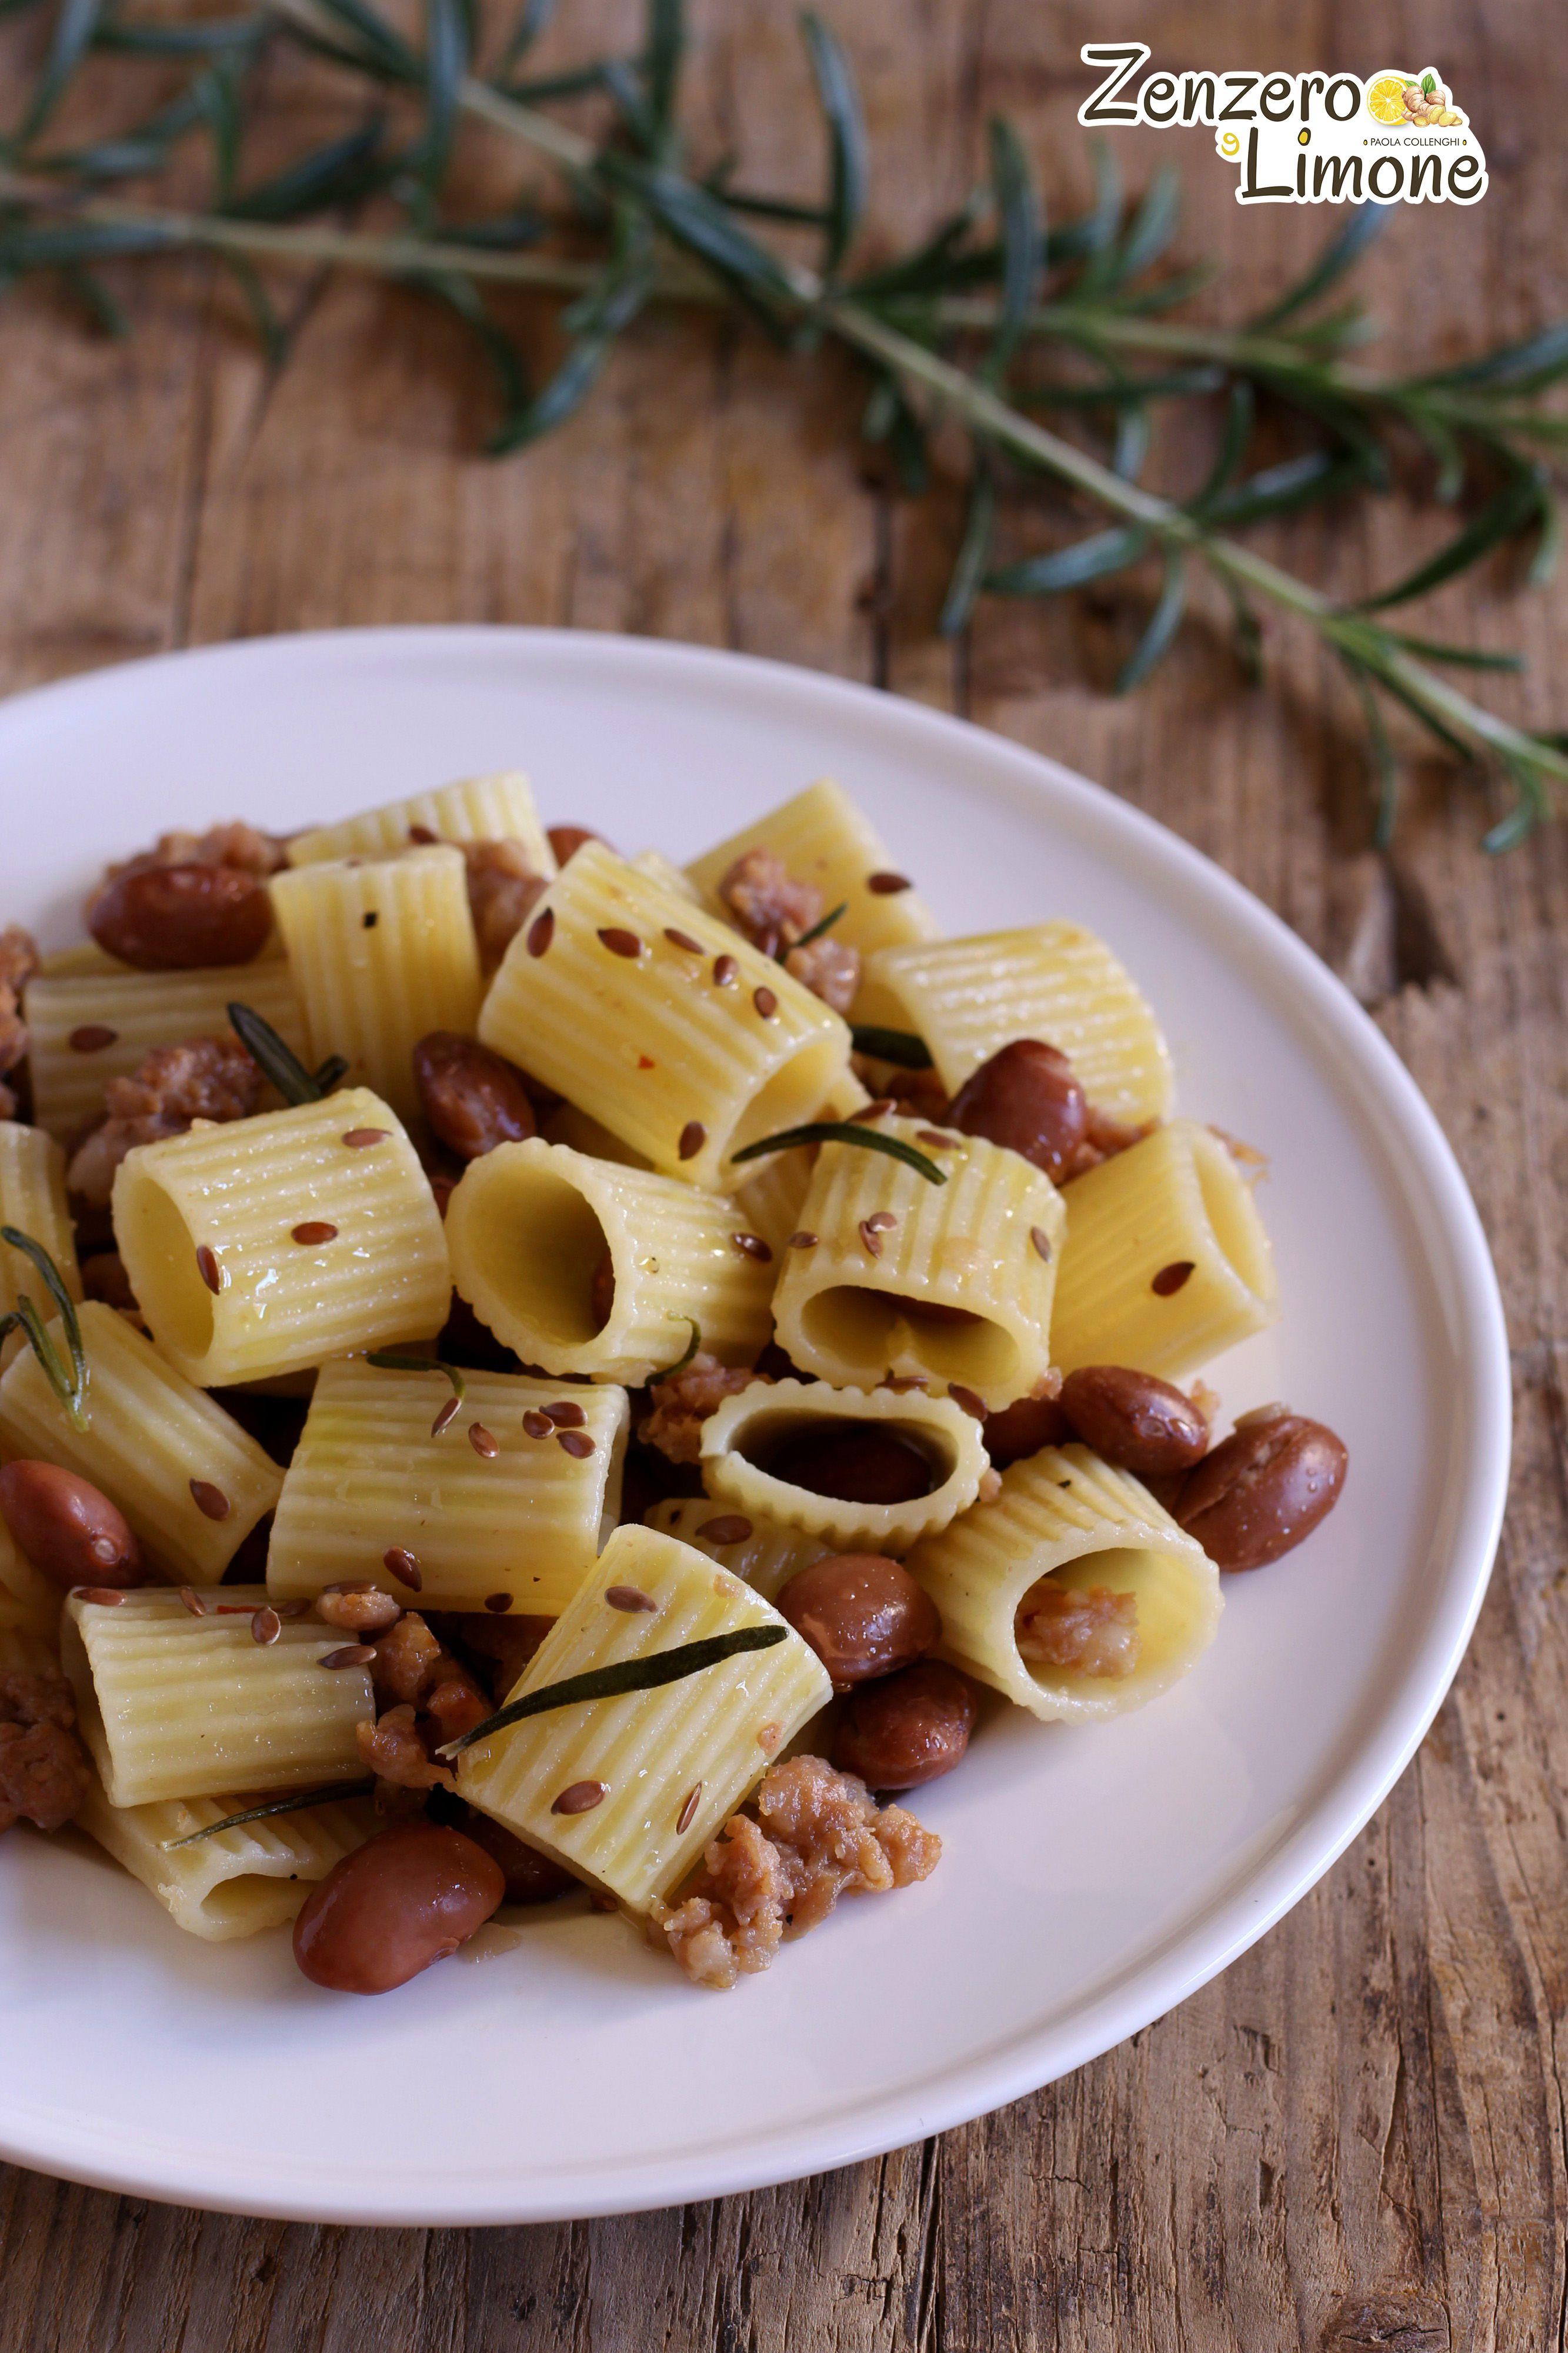 30578abe0143a326d60e6dcdb2bbc8f9 - Ricette Pastasciutta